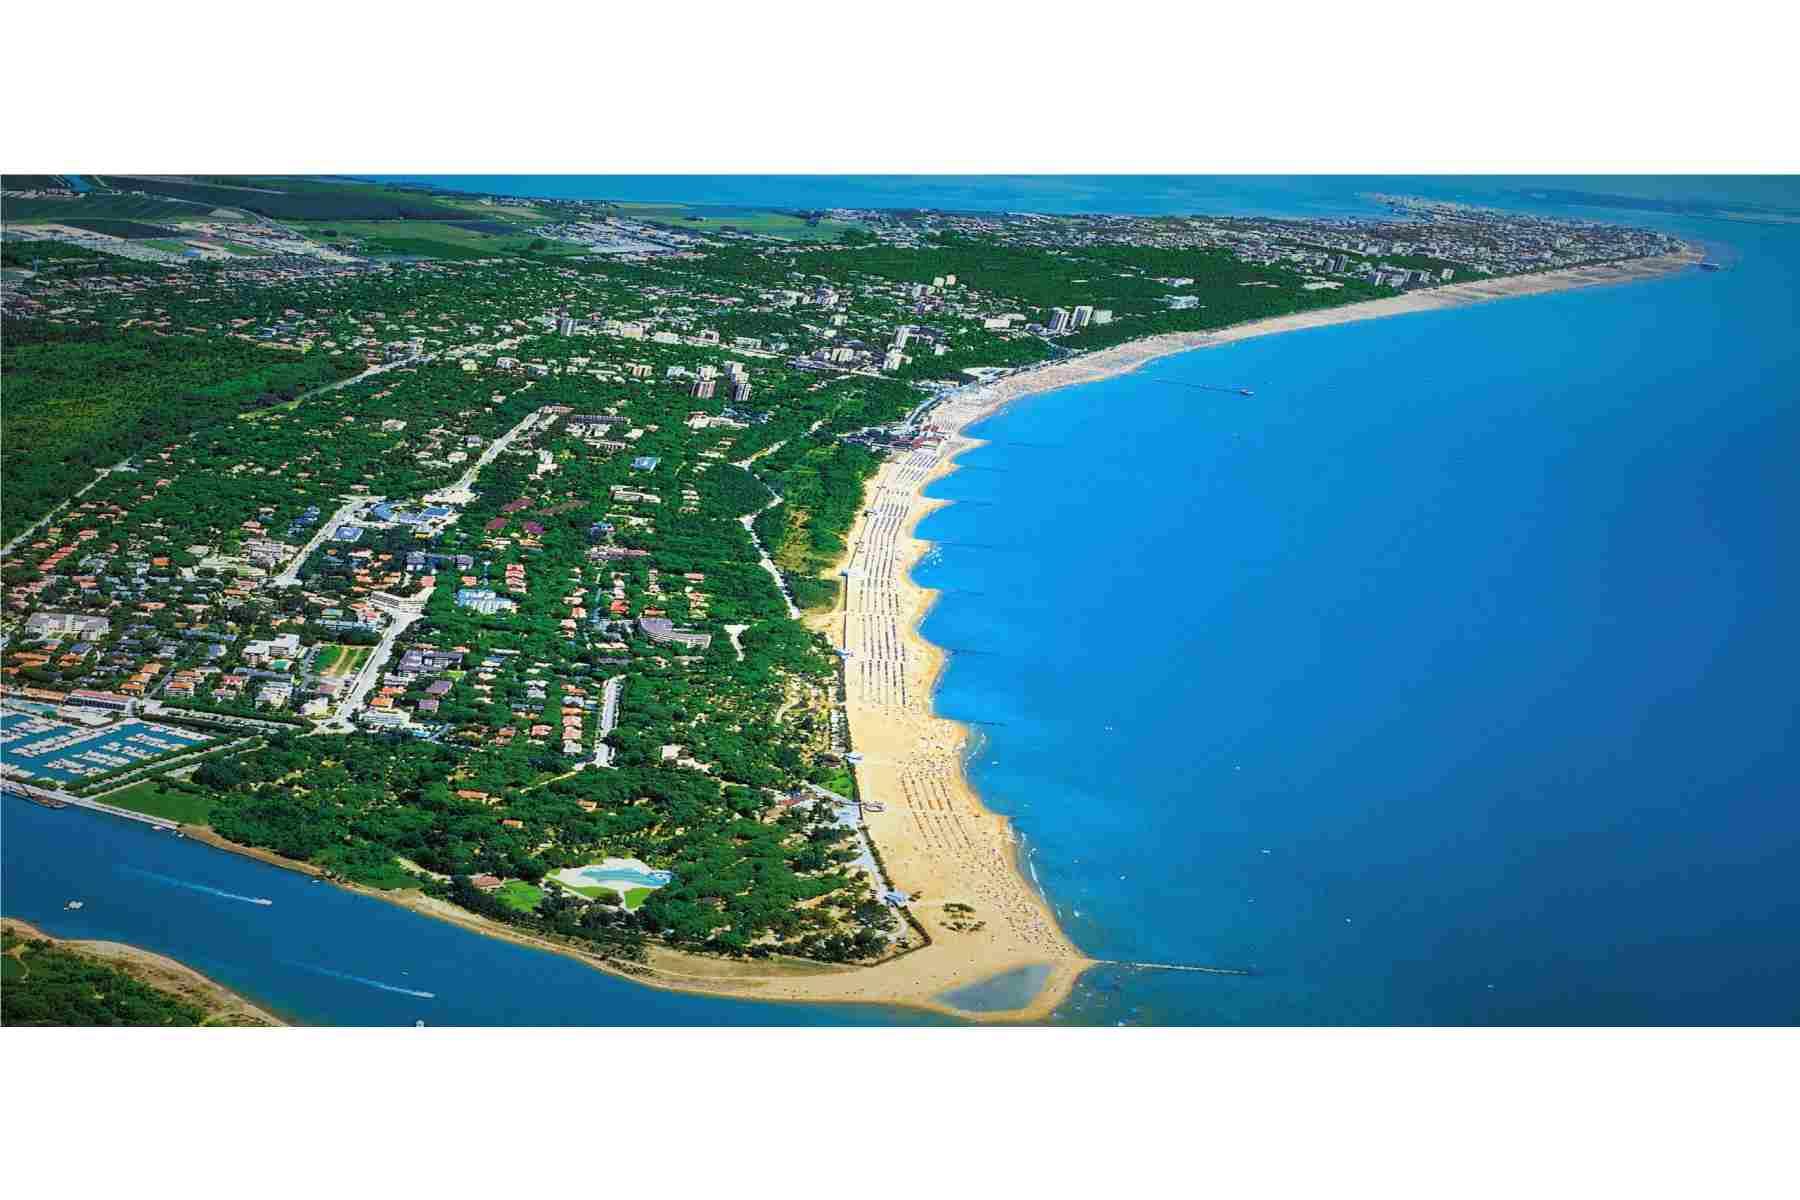 Golf Tour Hills & Sea: Collio, Grado and Lignano 7 days/6 nights - 3 ROUNDS Wedding Package